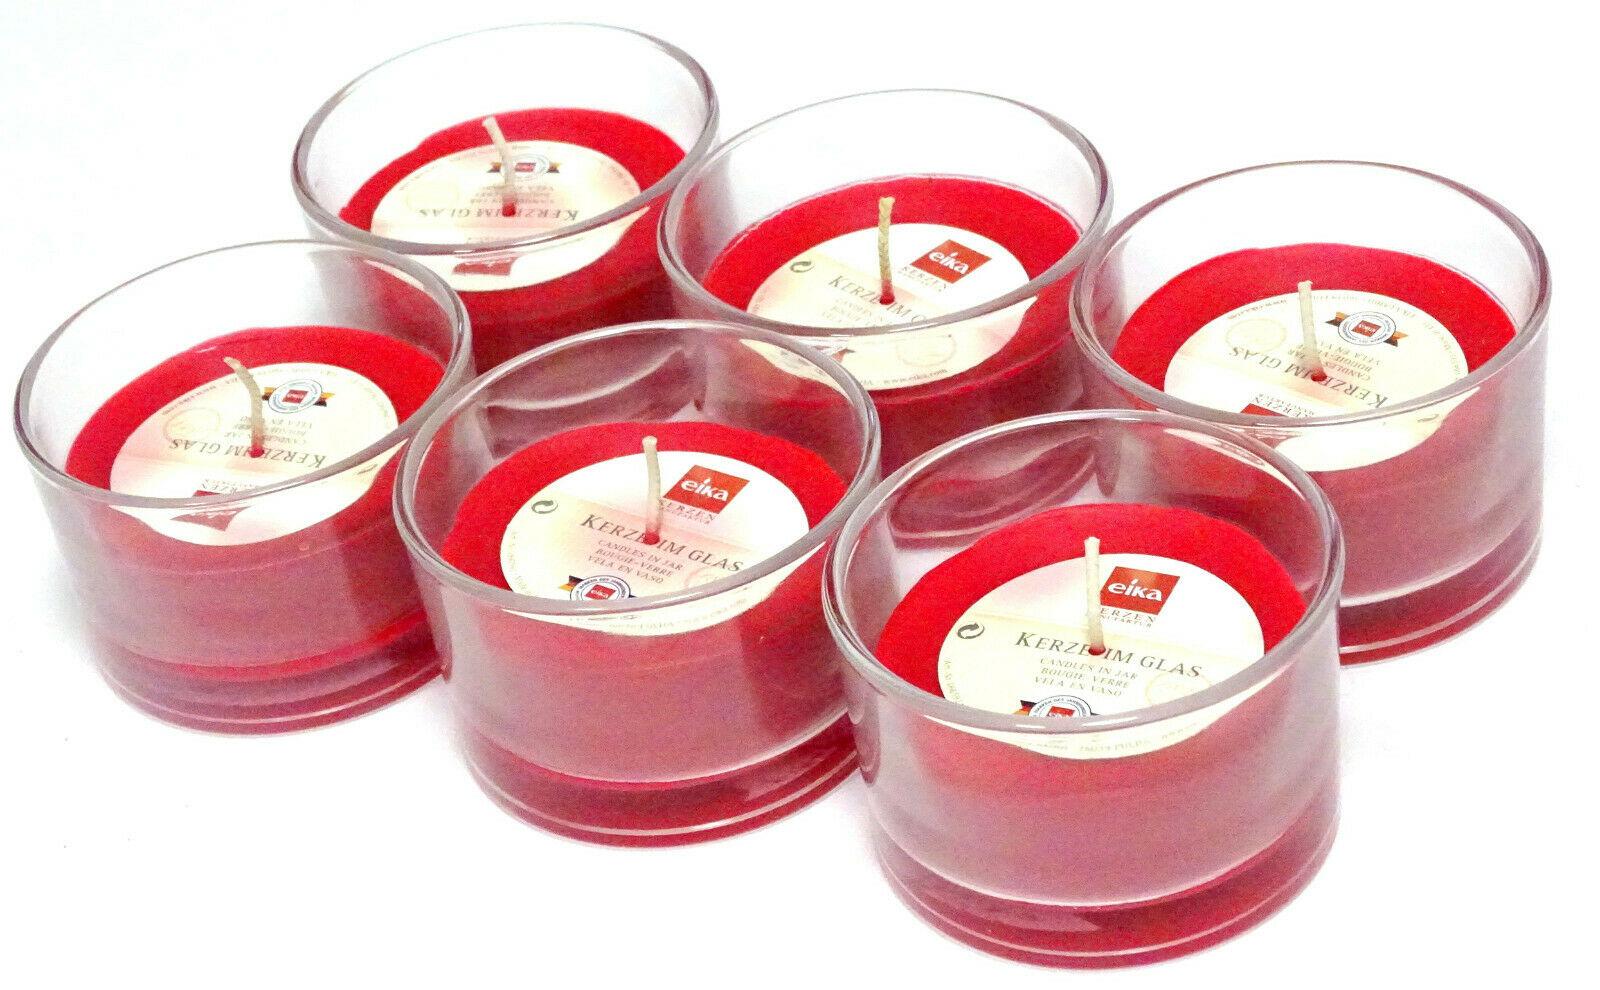 6 Stück Kerze im Glas durchgefärbte Wachs Ø 87 x 57 mm Kerzenglas Windlichtkerze - Rot 205